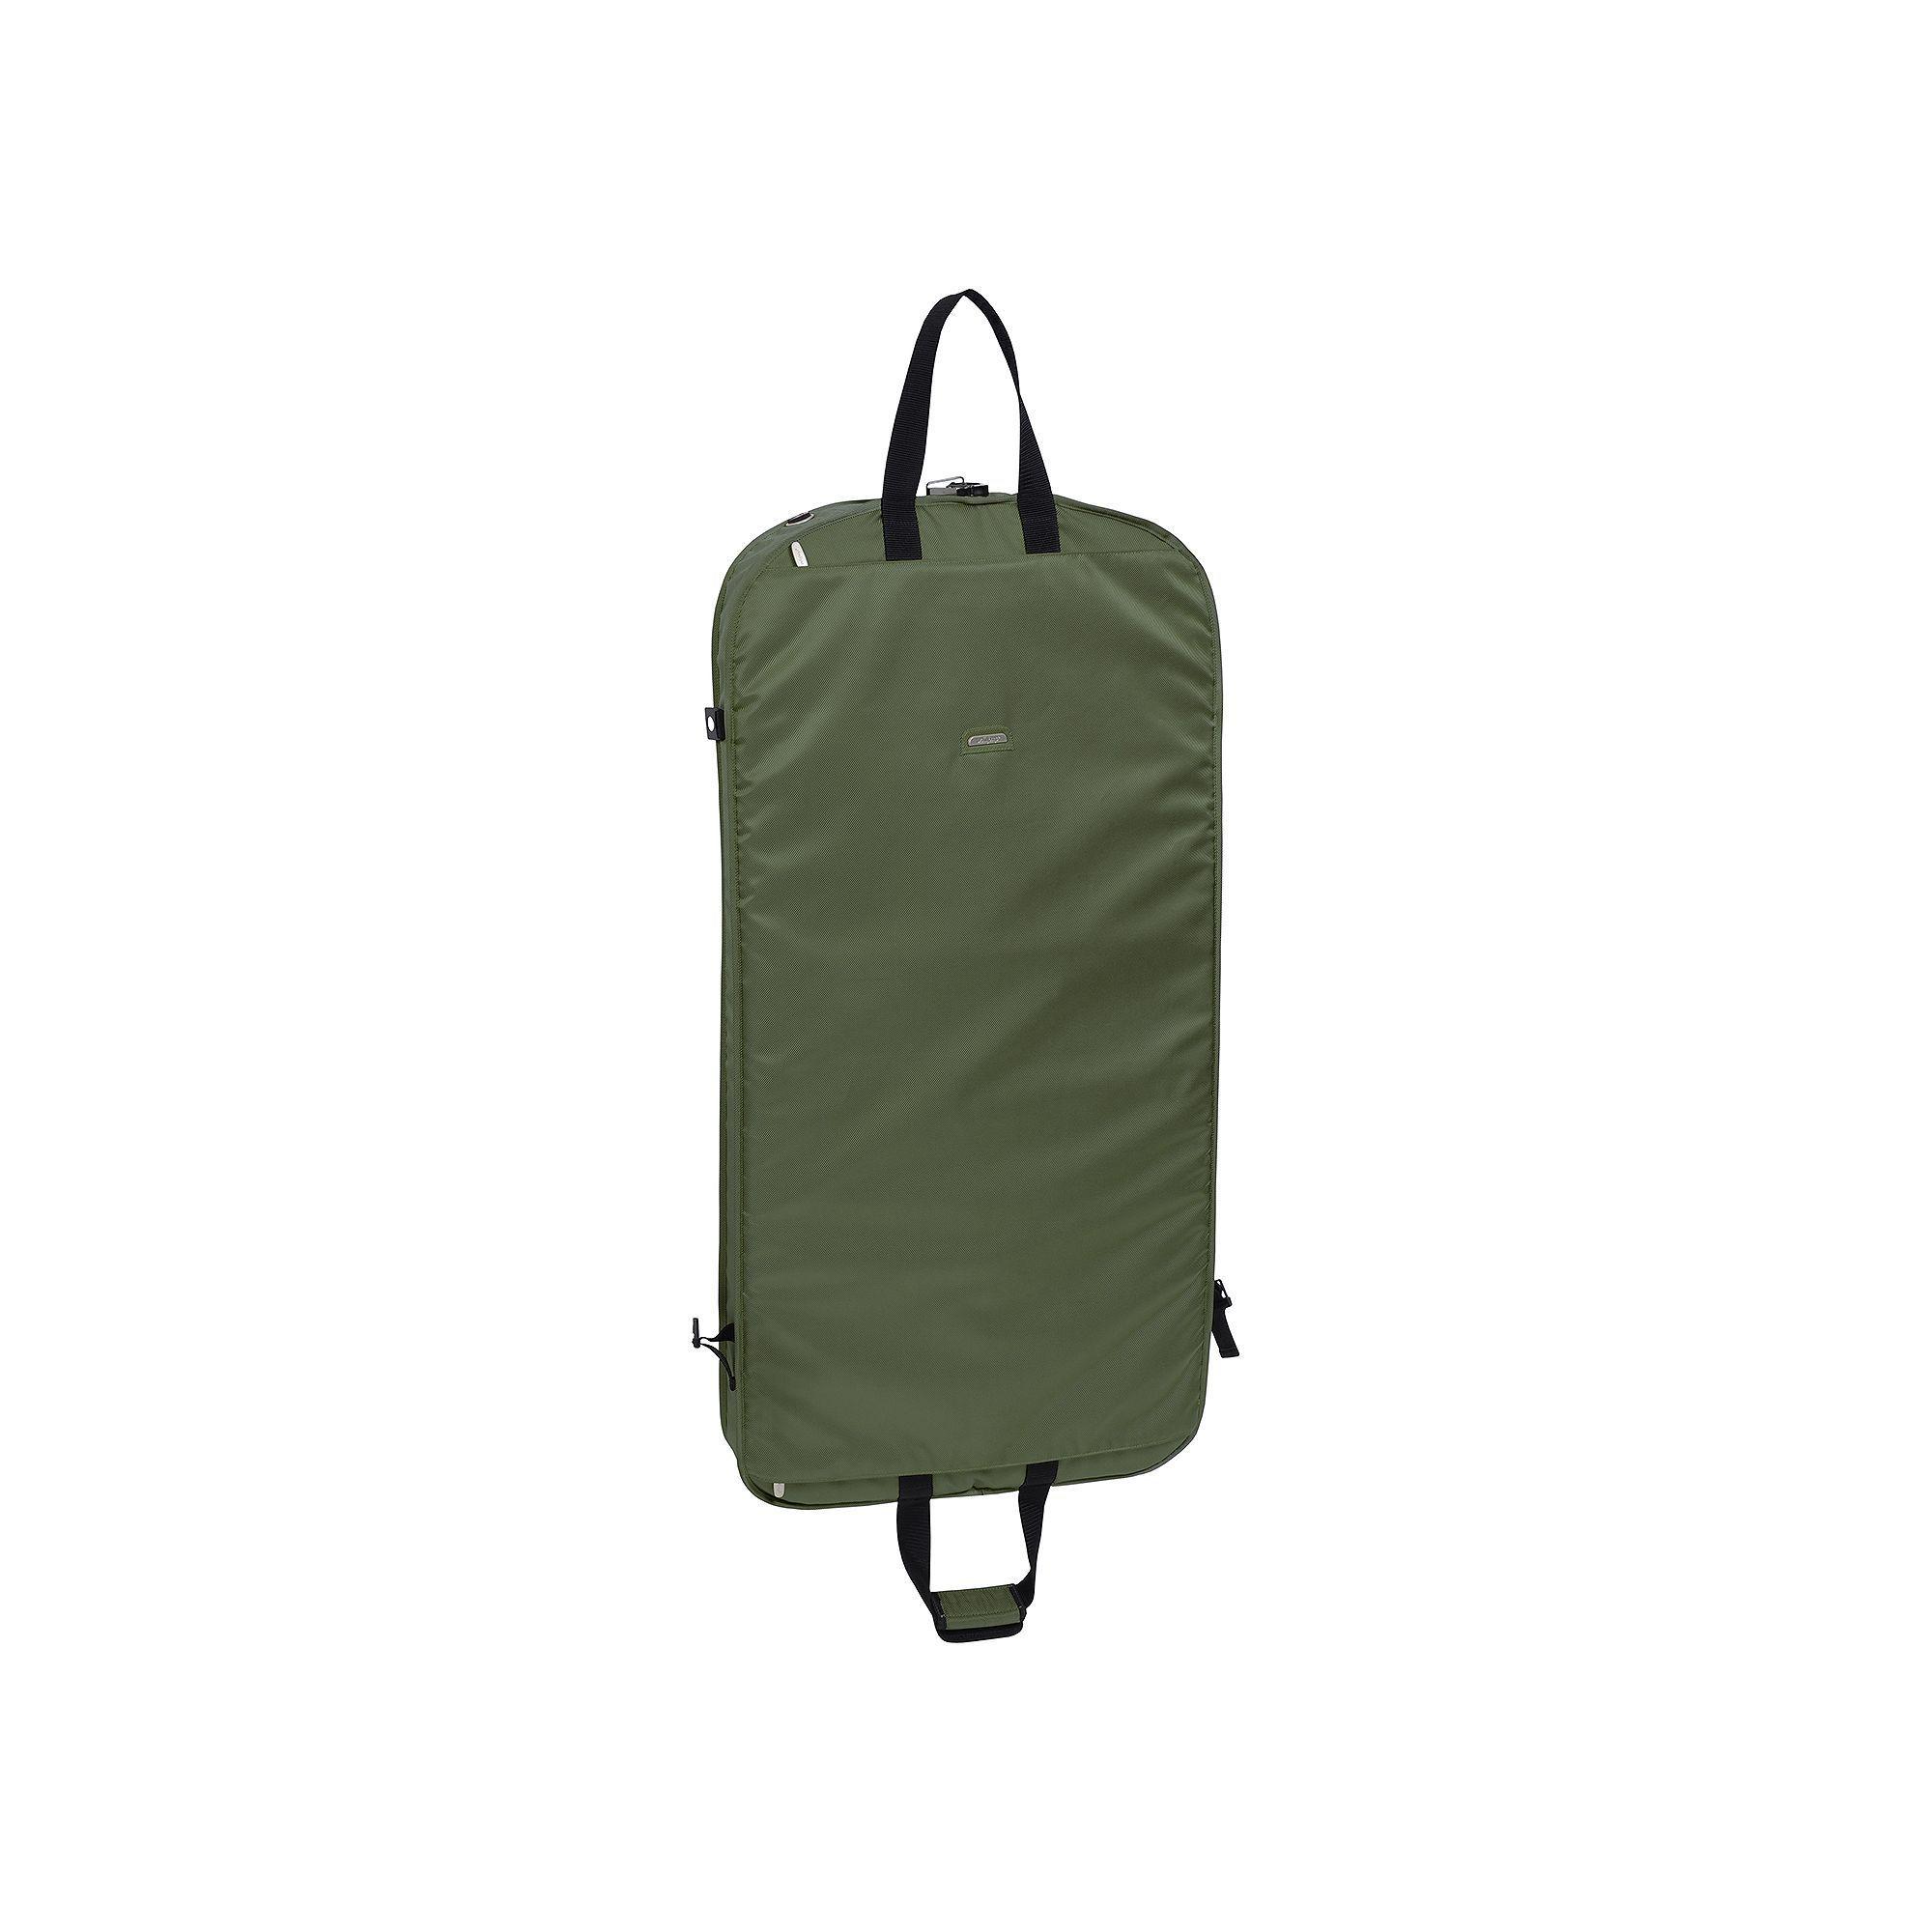 WallyBags 52-Inch Shoulder Strap Garment Bag, Green, Durable   Products a9b22c923b